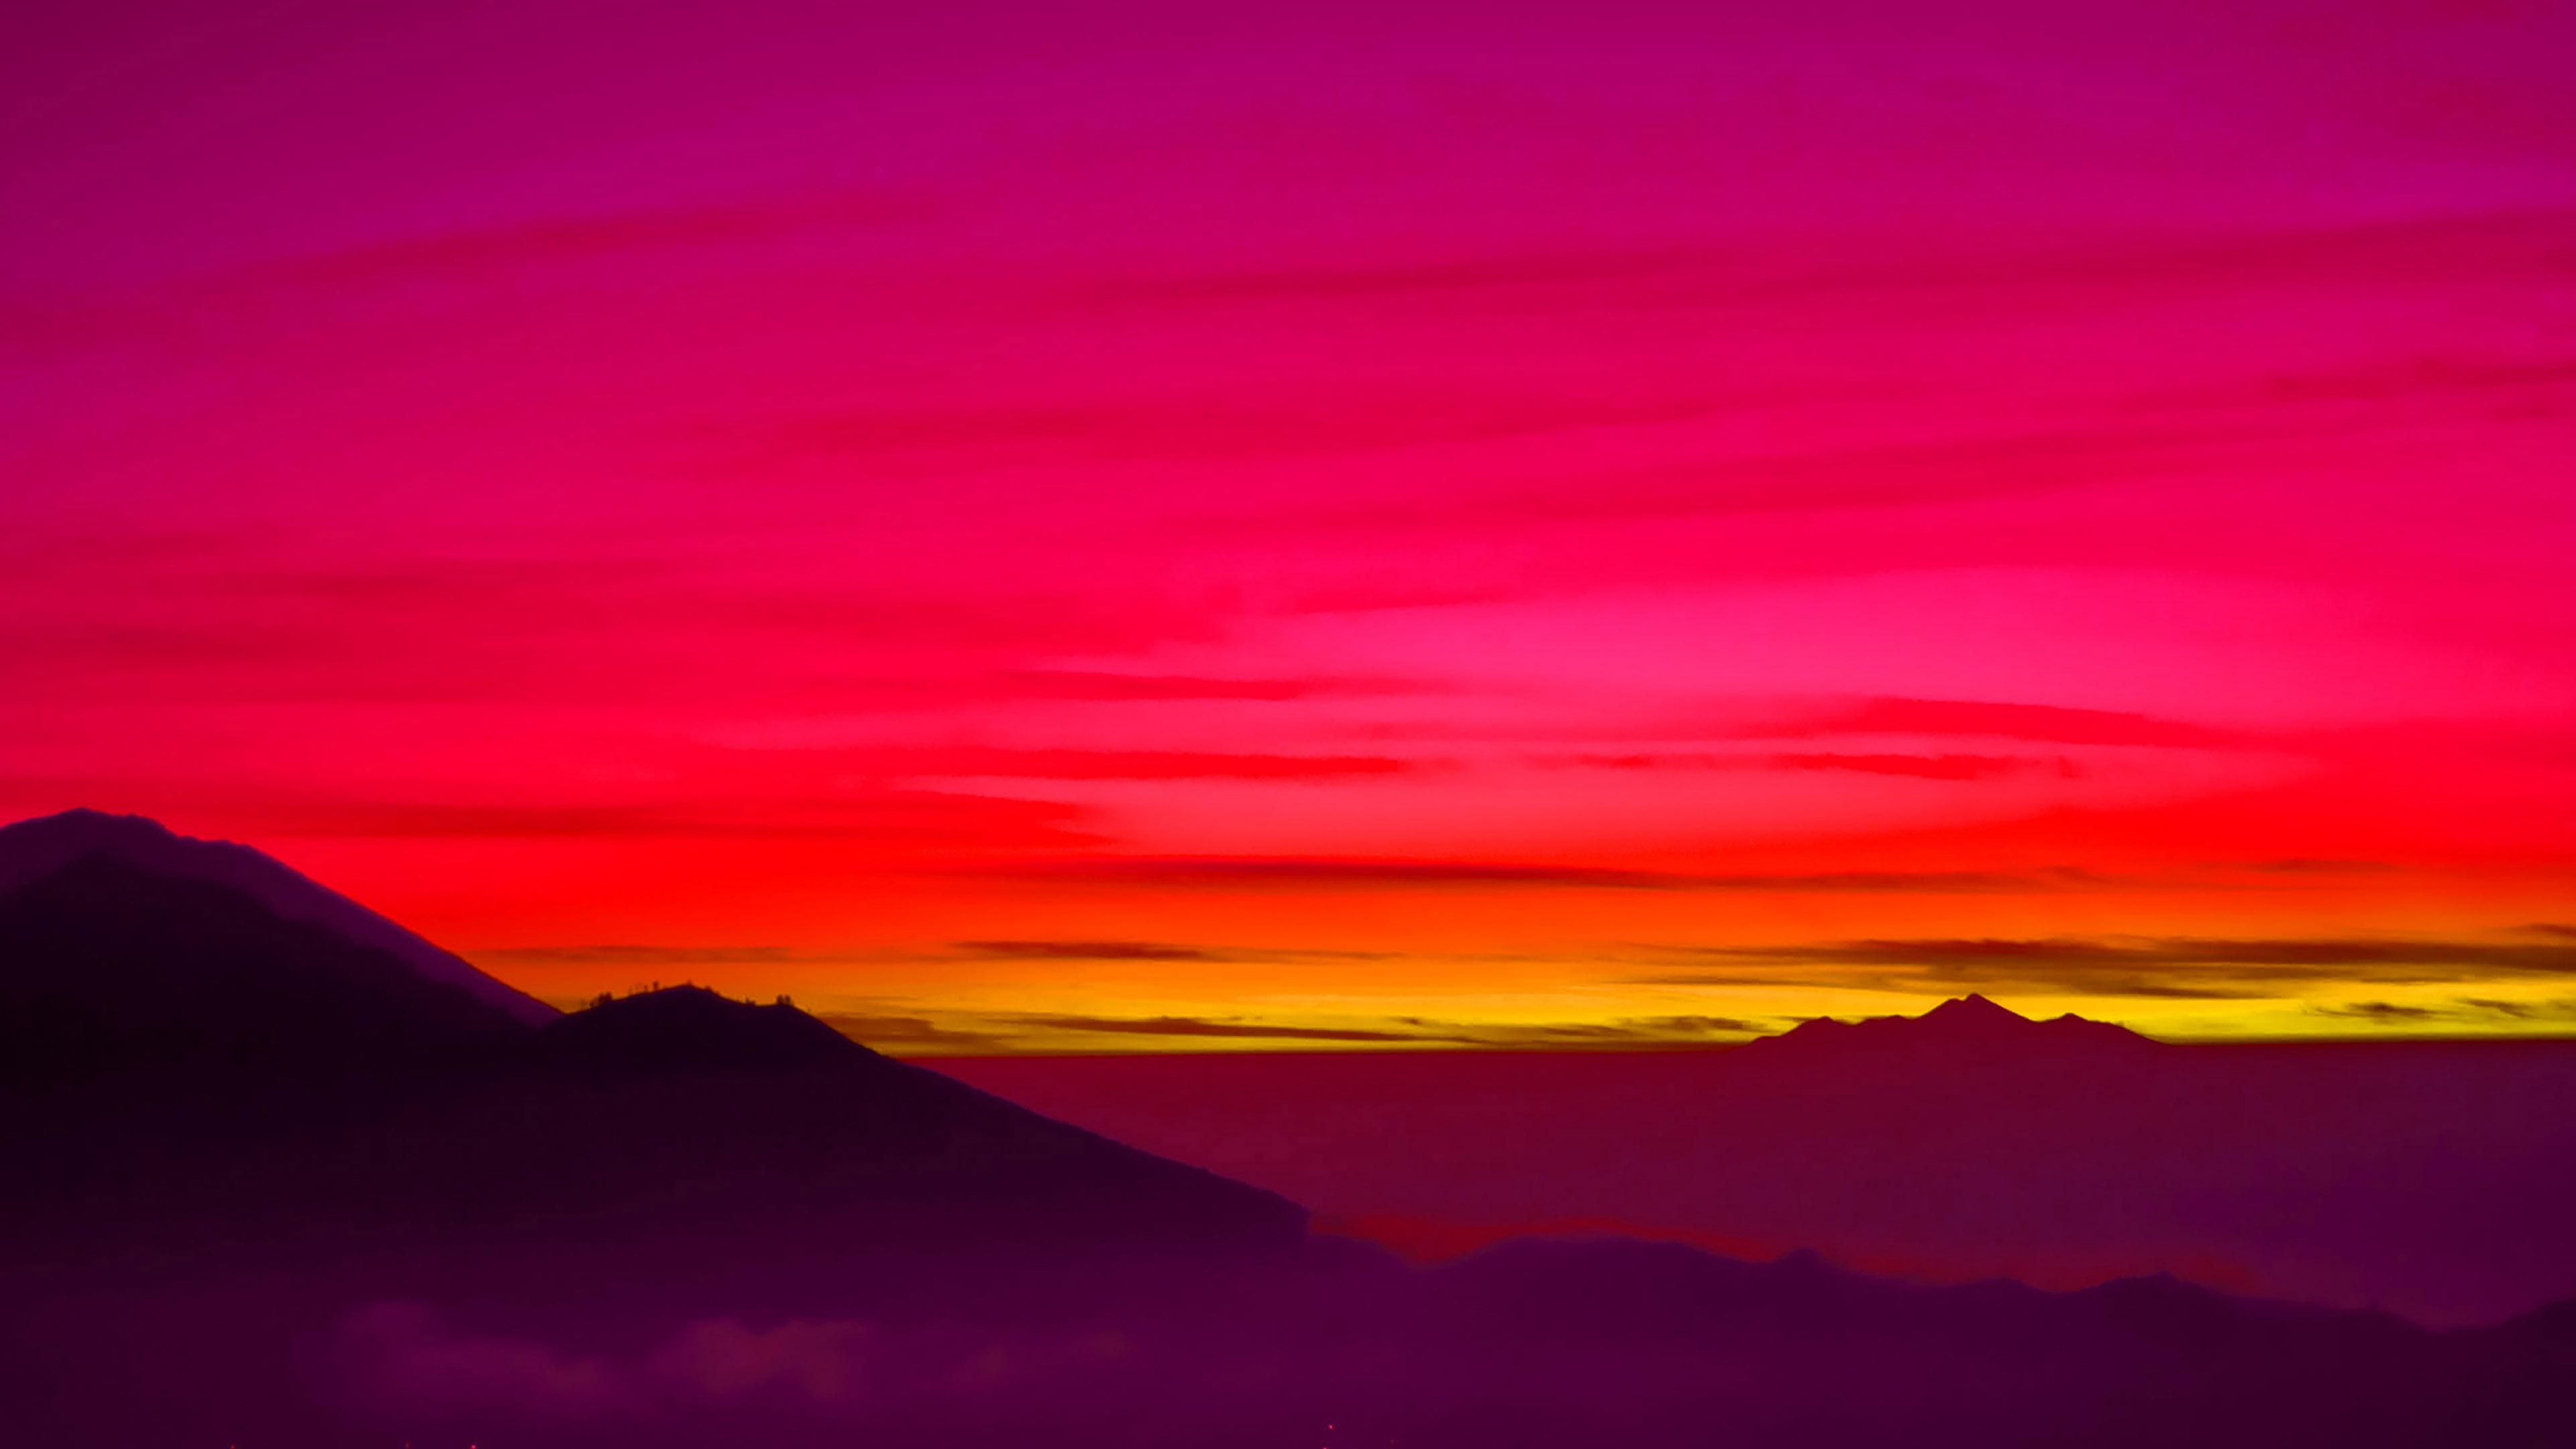 Iphone X Gold Wallpaper Mc97 Wallpaper Red Balinese Dream Sea Mountain Sunset